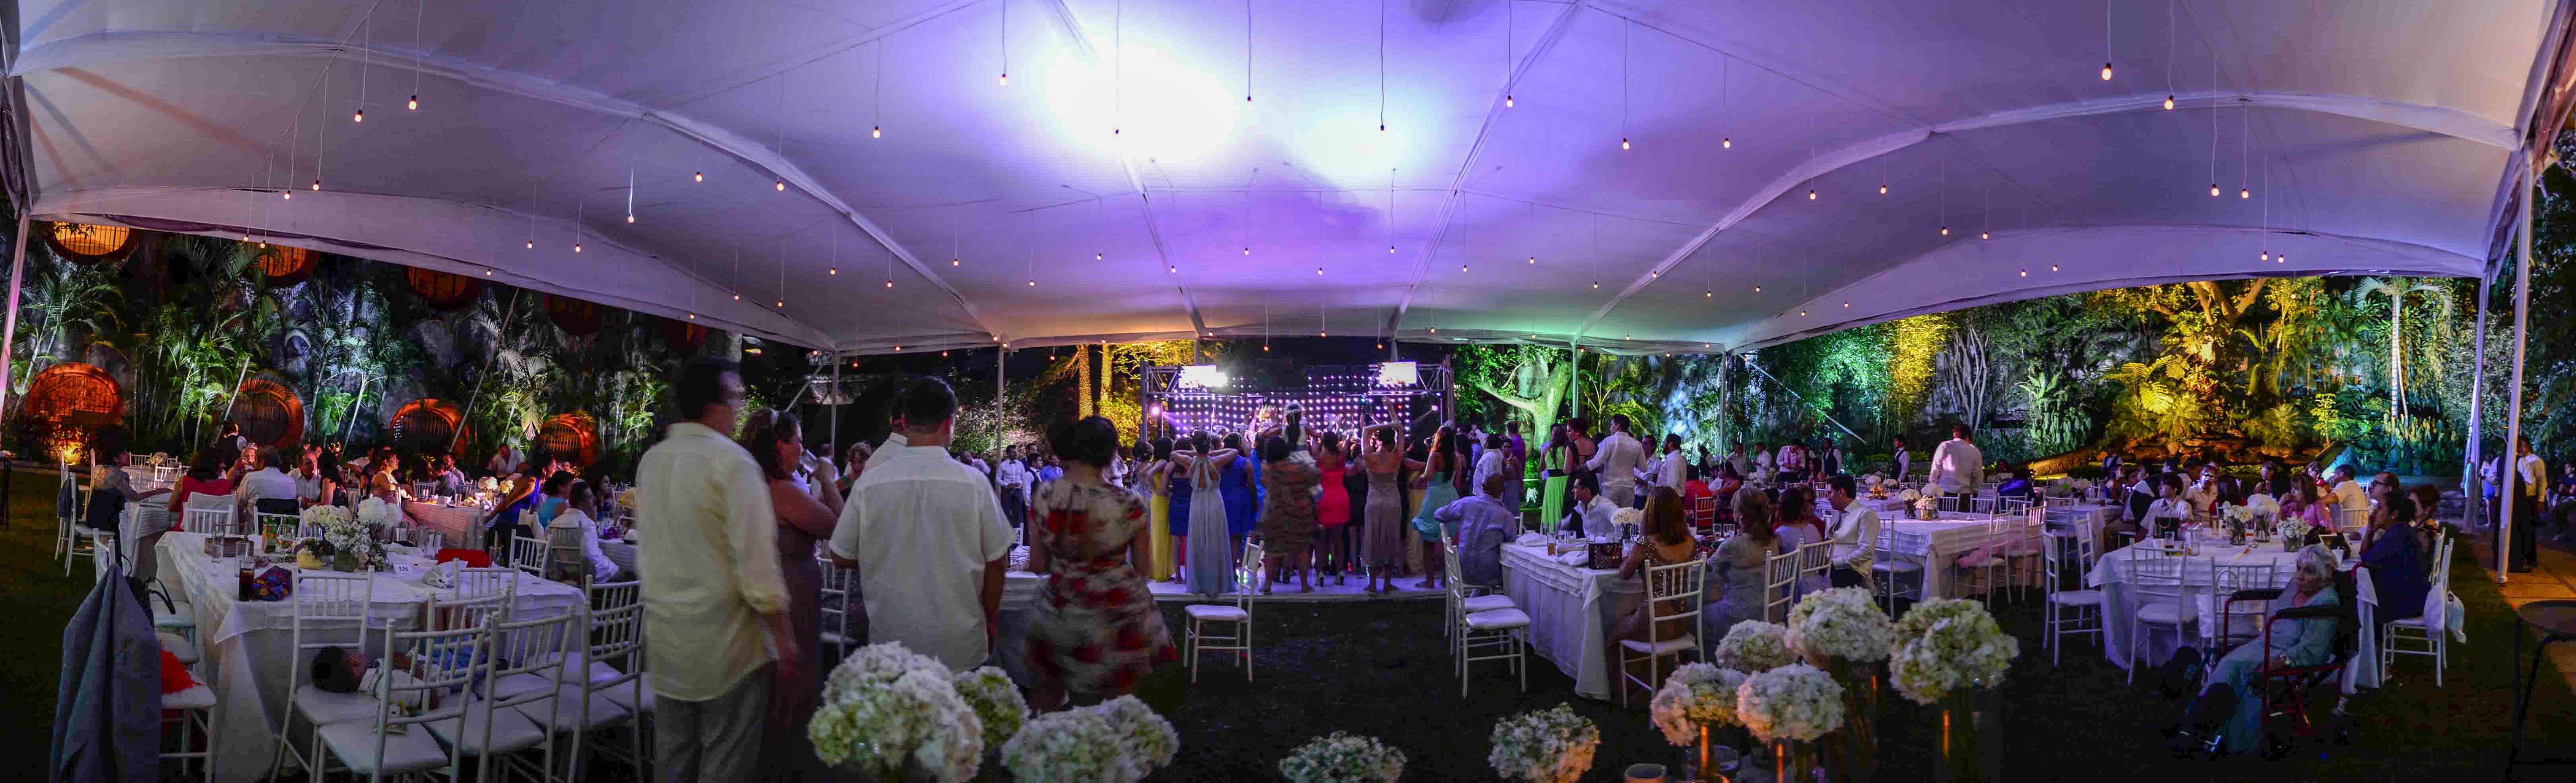 Noche de Fiesta, Boda, Pista de Baile, Decoración, Bodas en Morelos ...